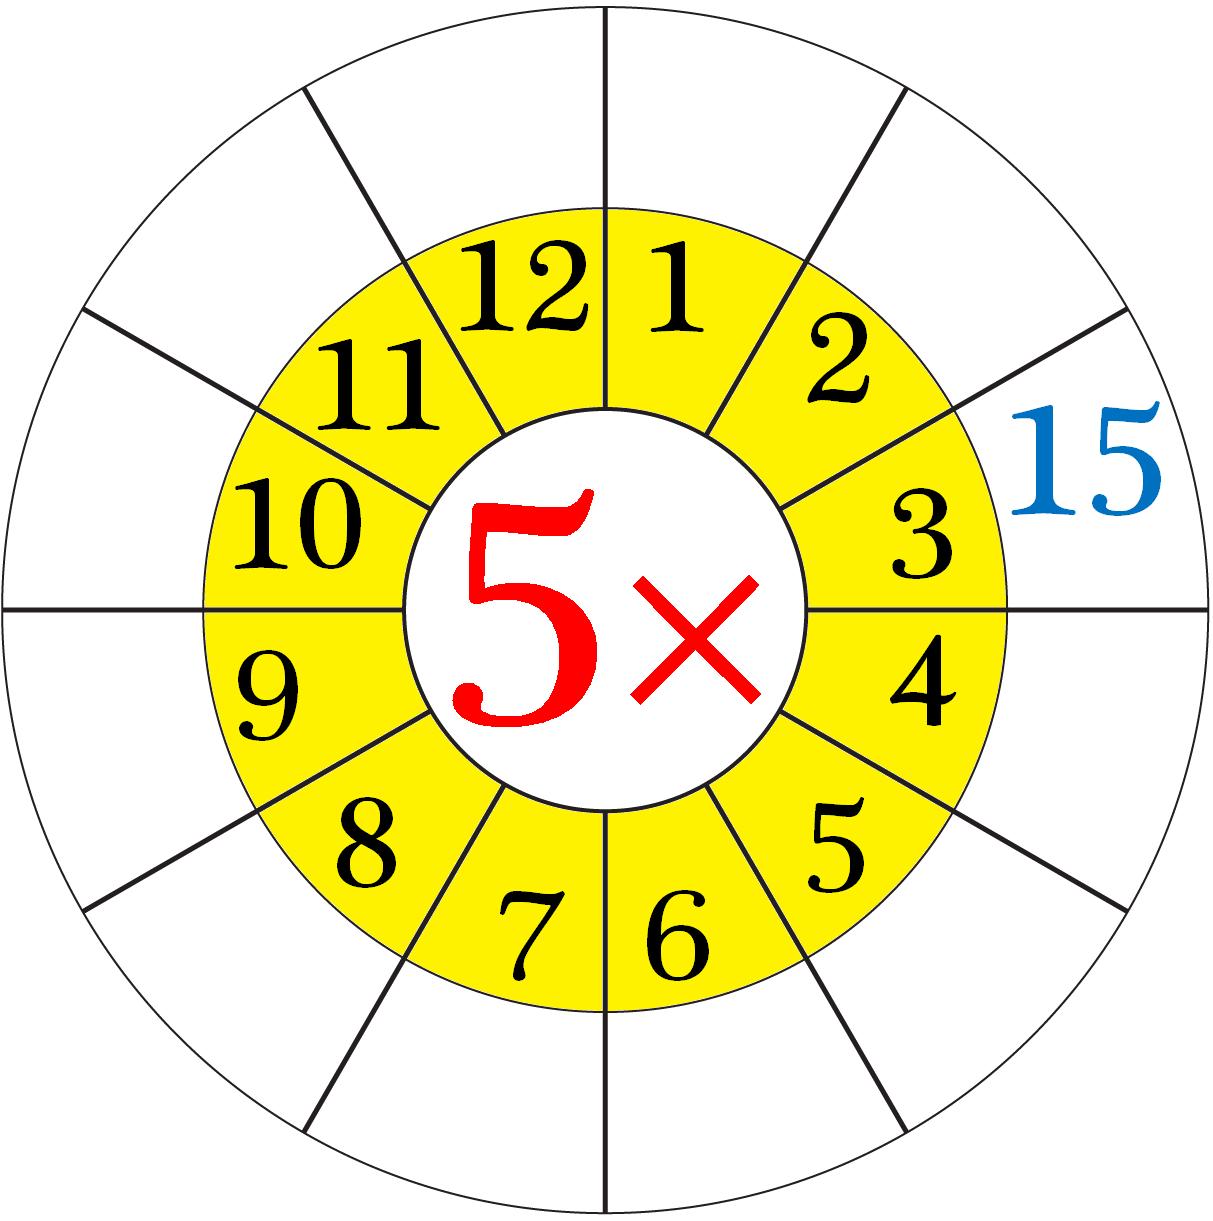 Worksheet On Multiplication Table Of 5